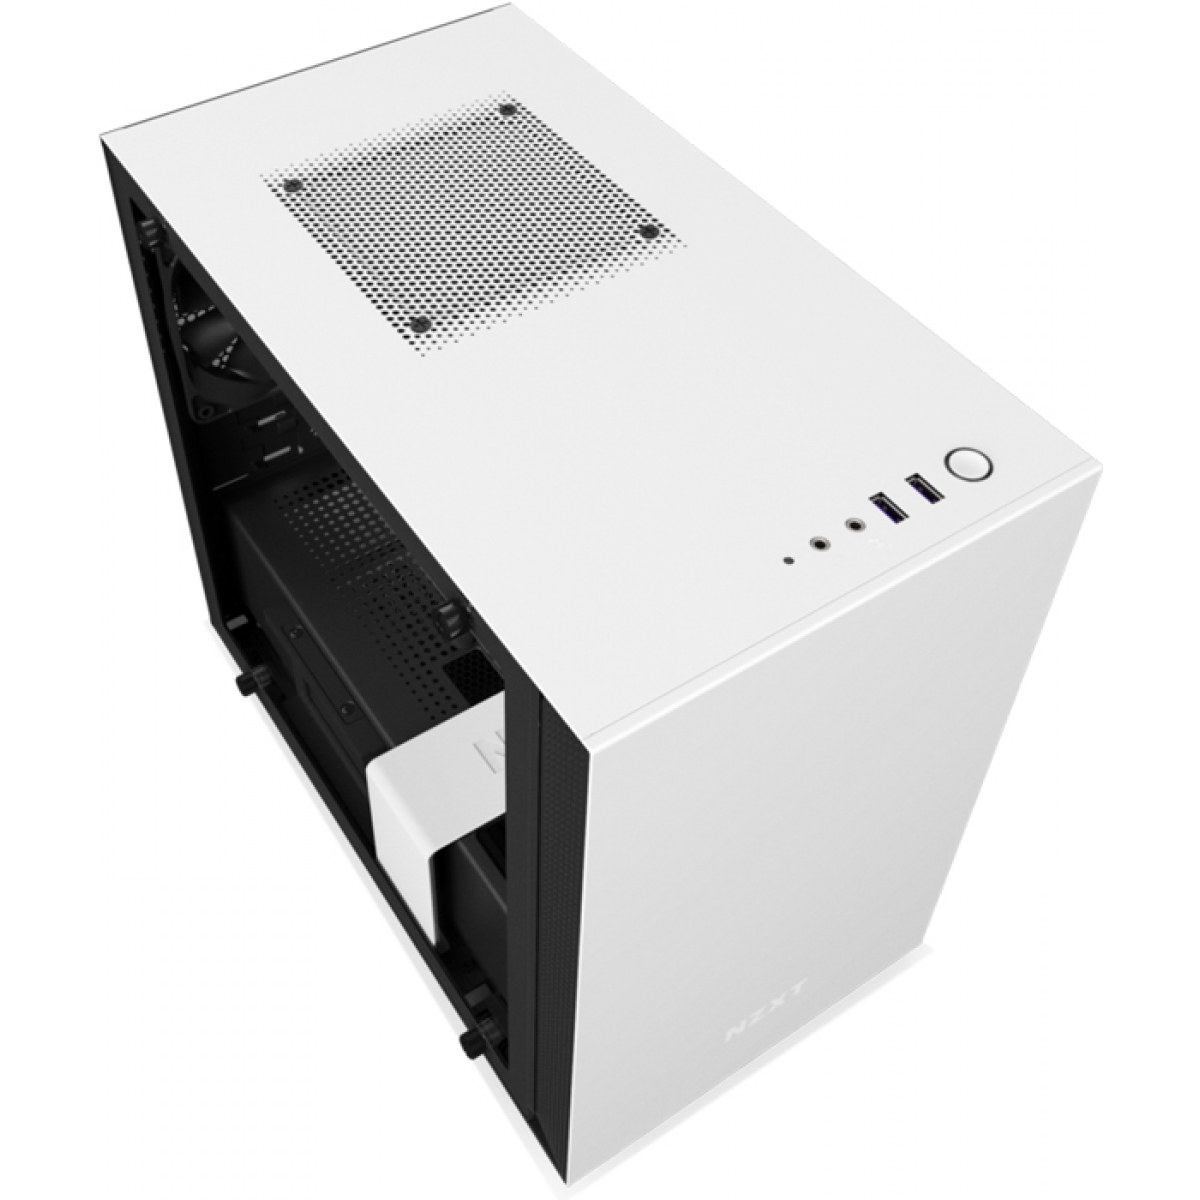 Gabinete Gamer NZXT H200i Smart, Mid Tower, Com 2 Fans, Vidro Temperado, White, Sem Fonte, CA-H200W-WB